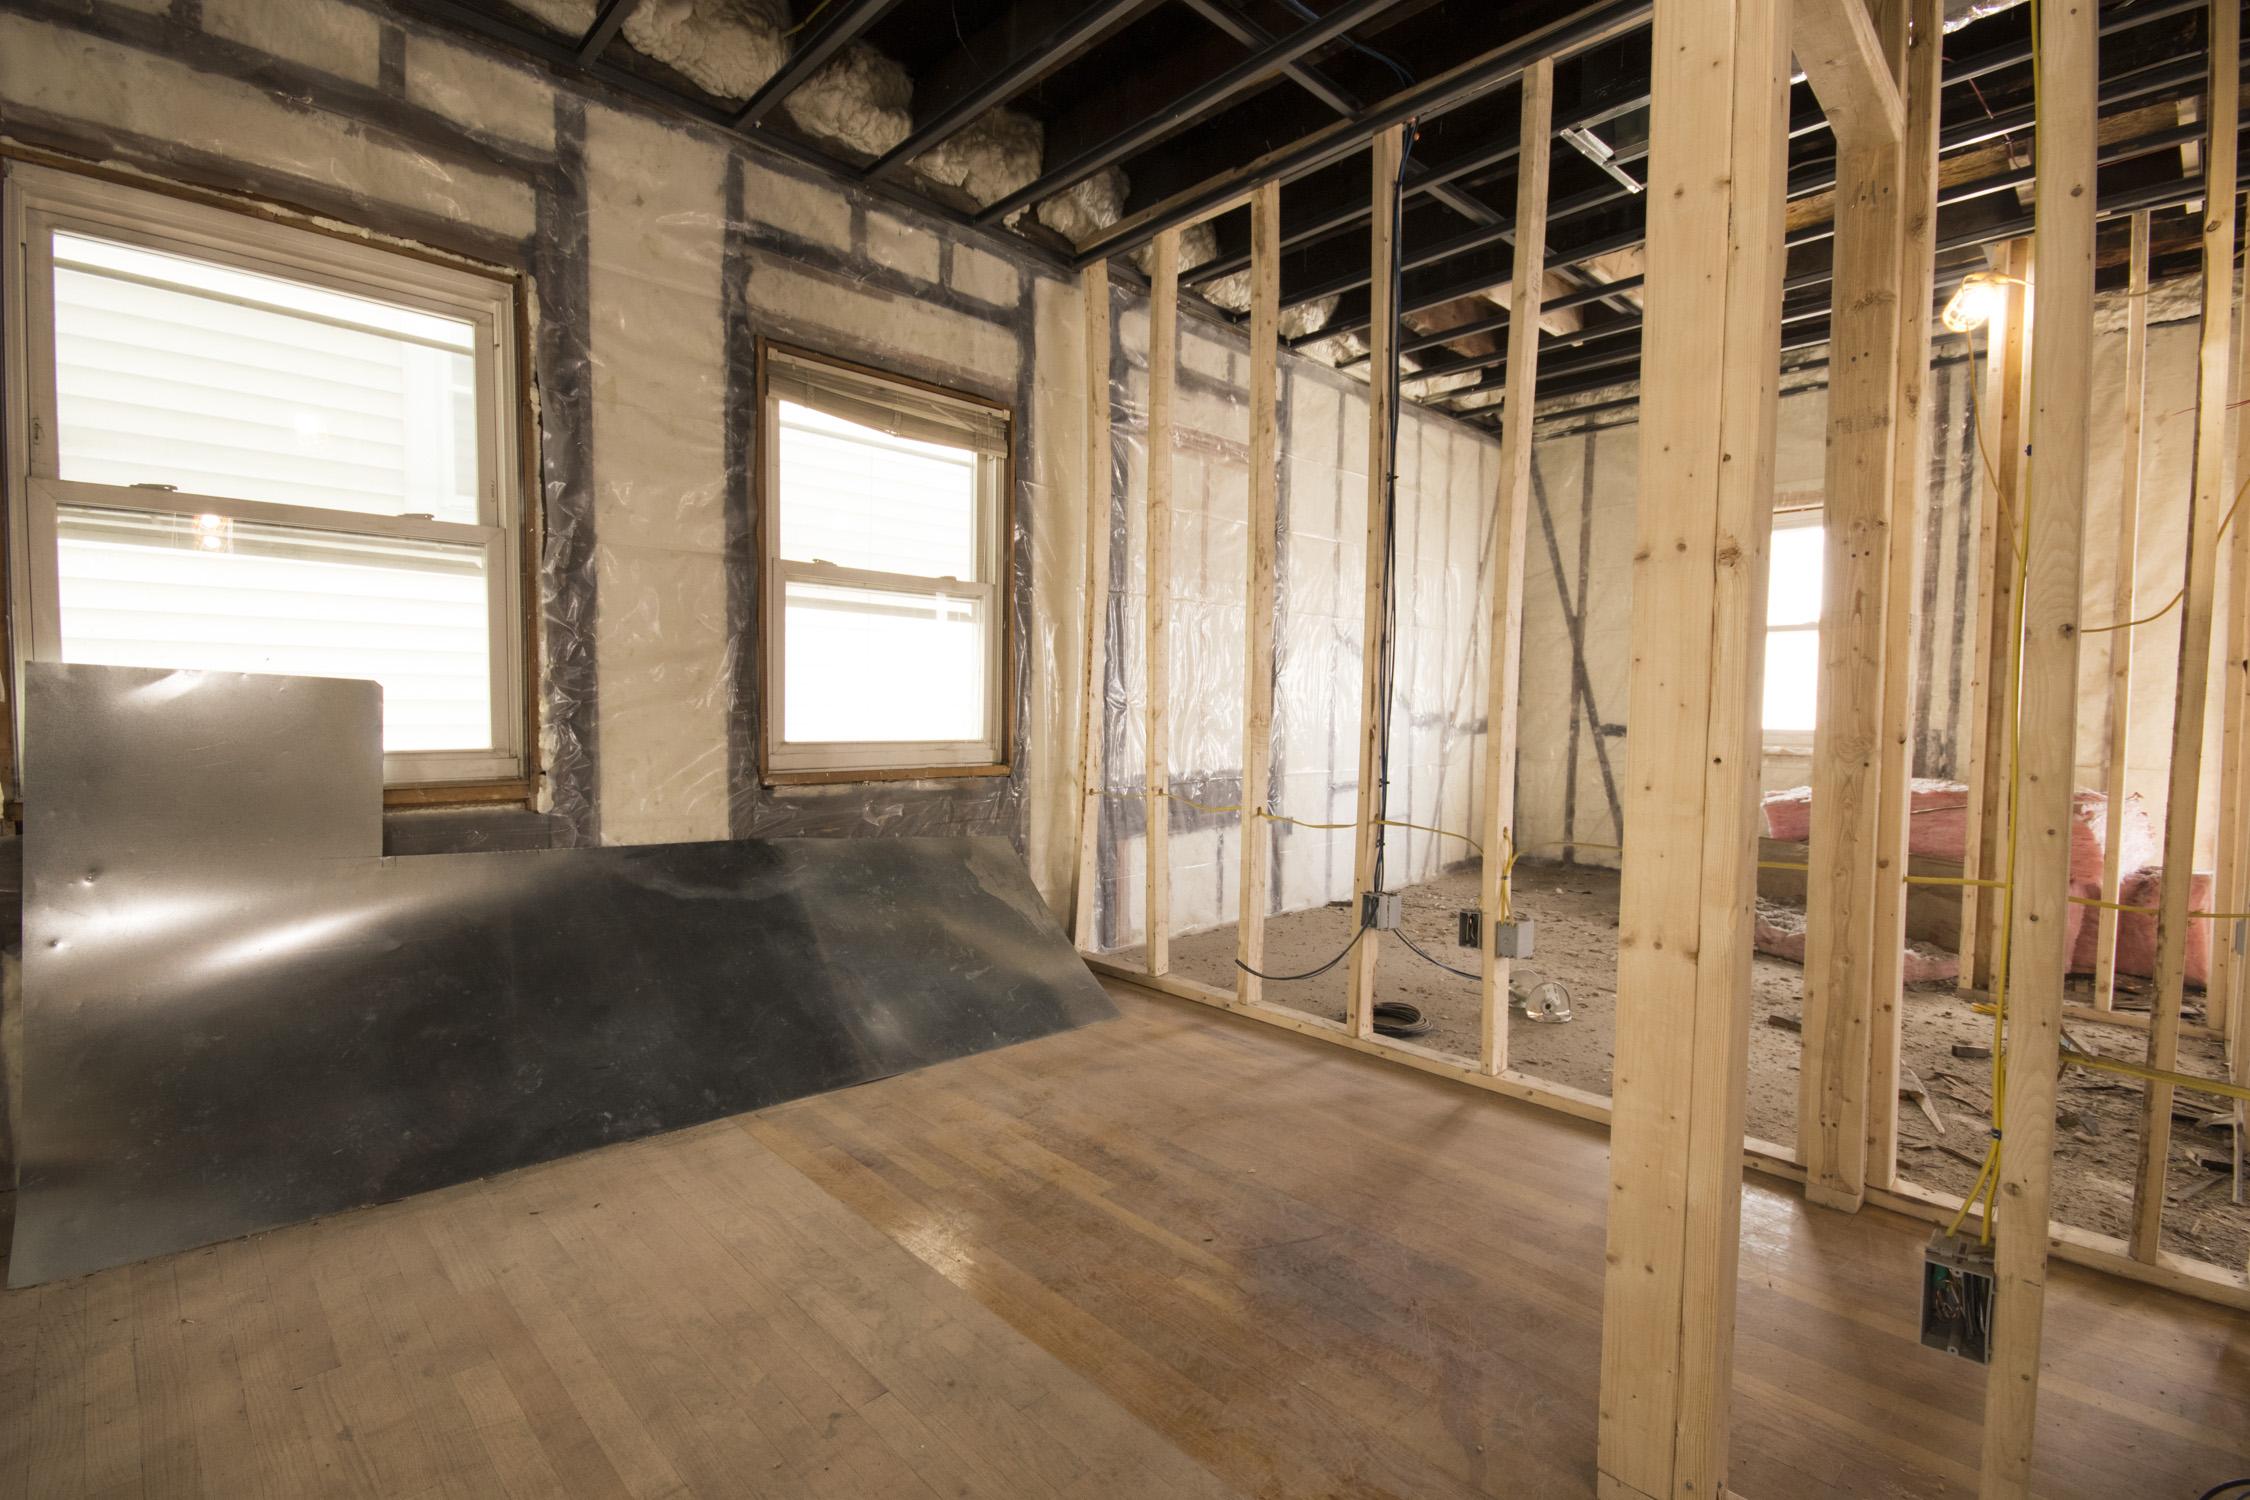 25 Darling Project P Northeast Contractors Boston General Contractors_197